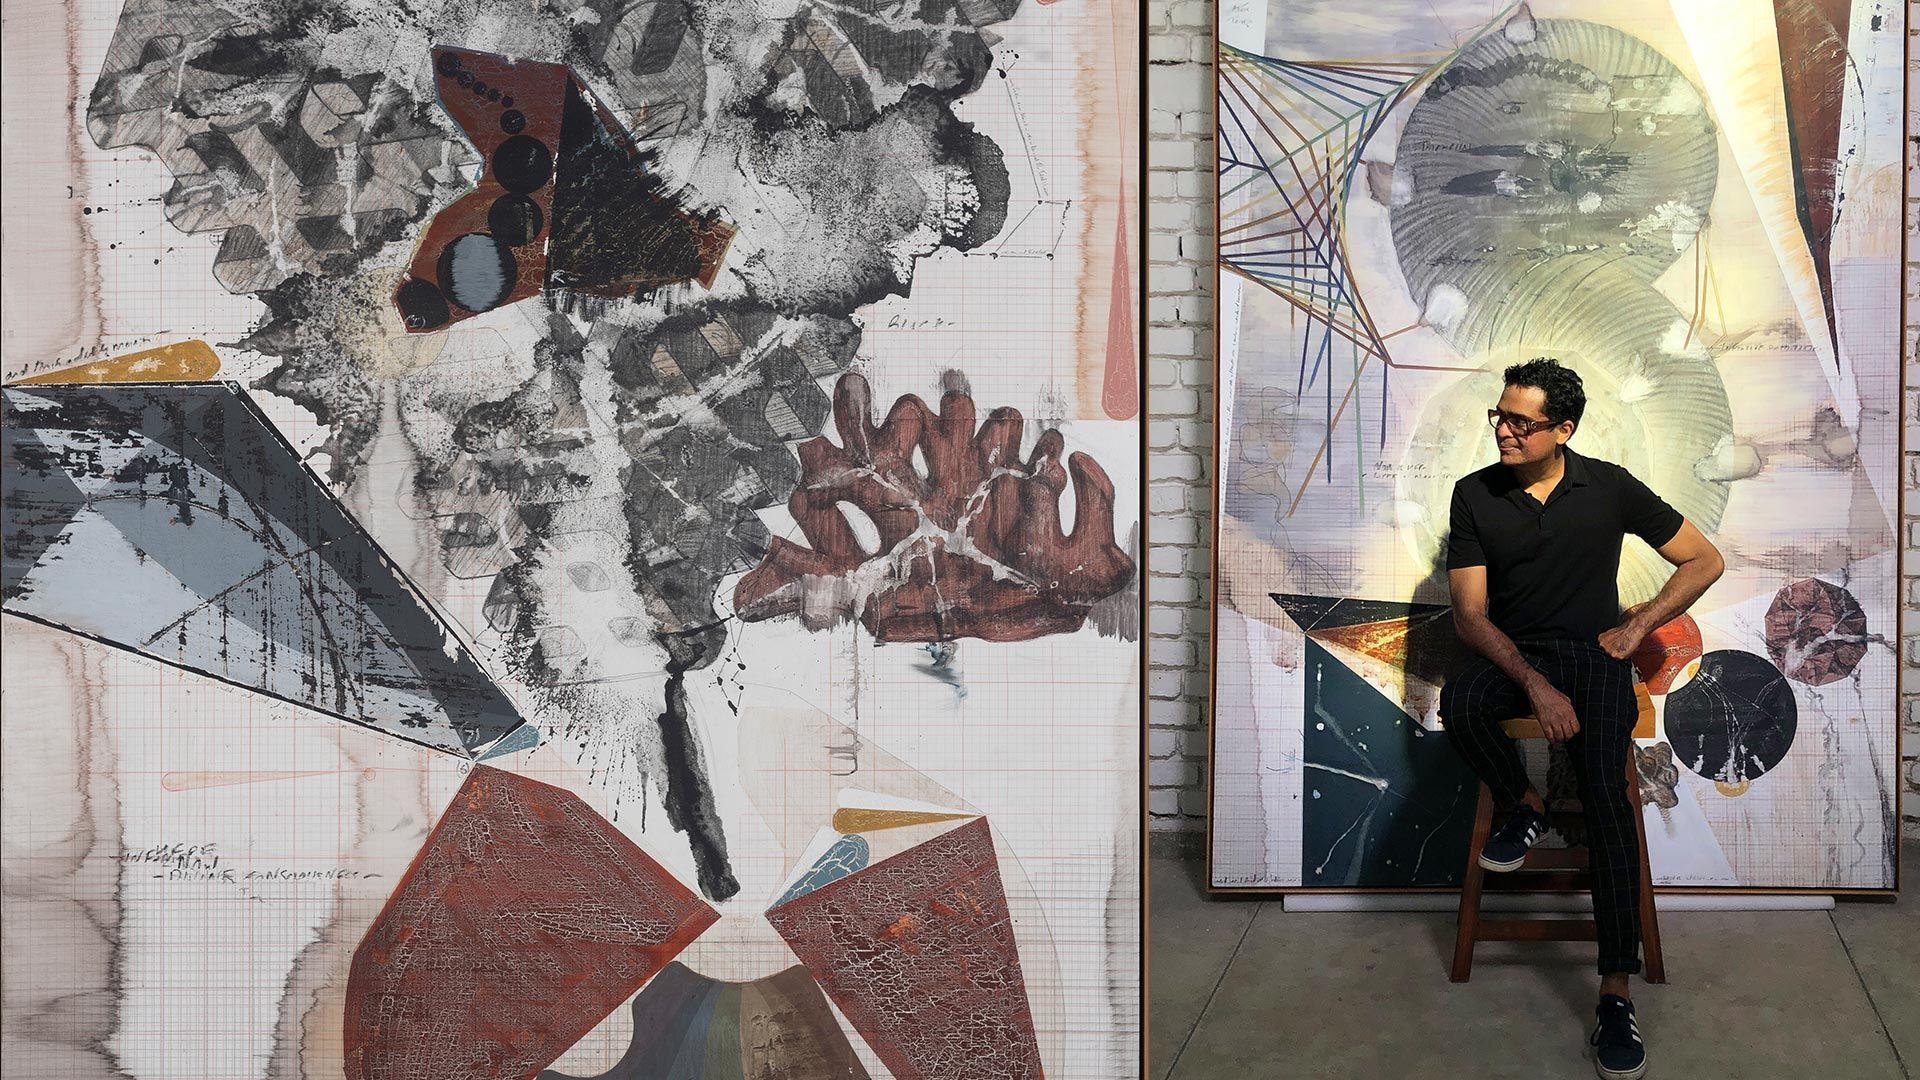 Jitish Kallat: Phase Transition at Galerie Templon